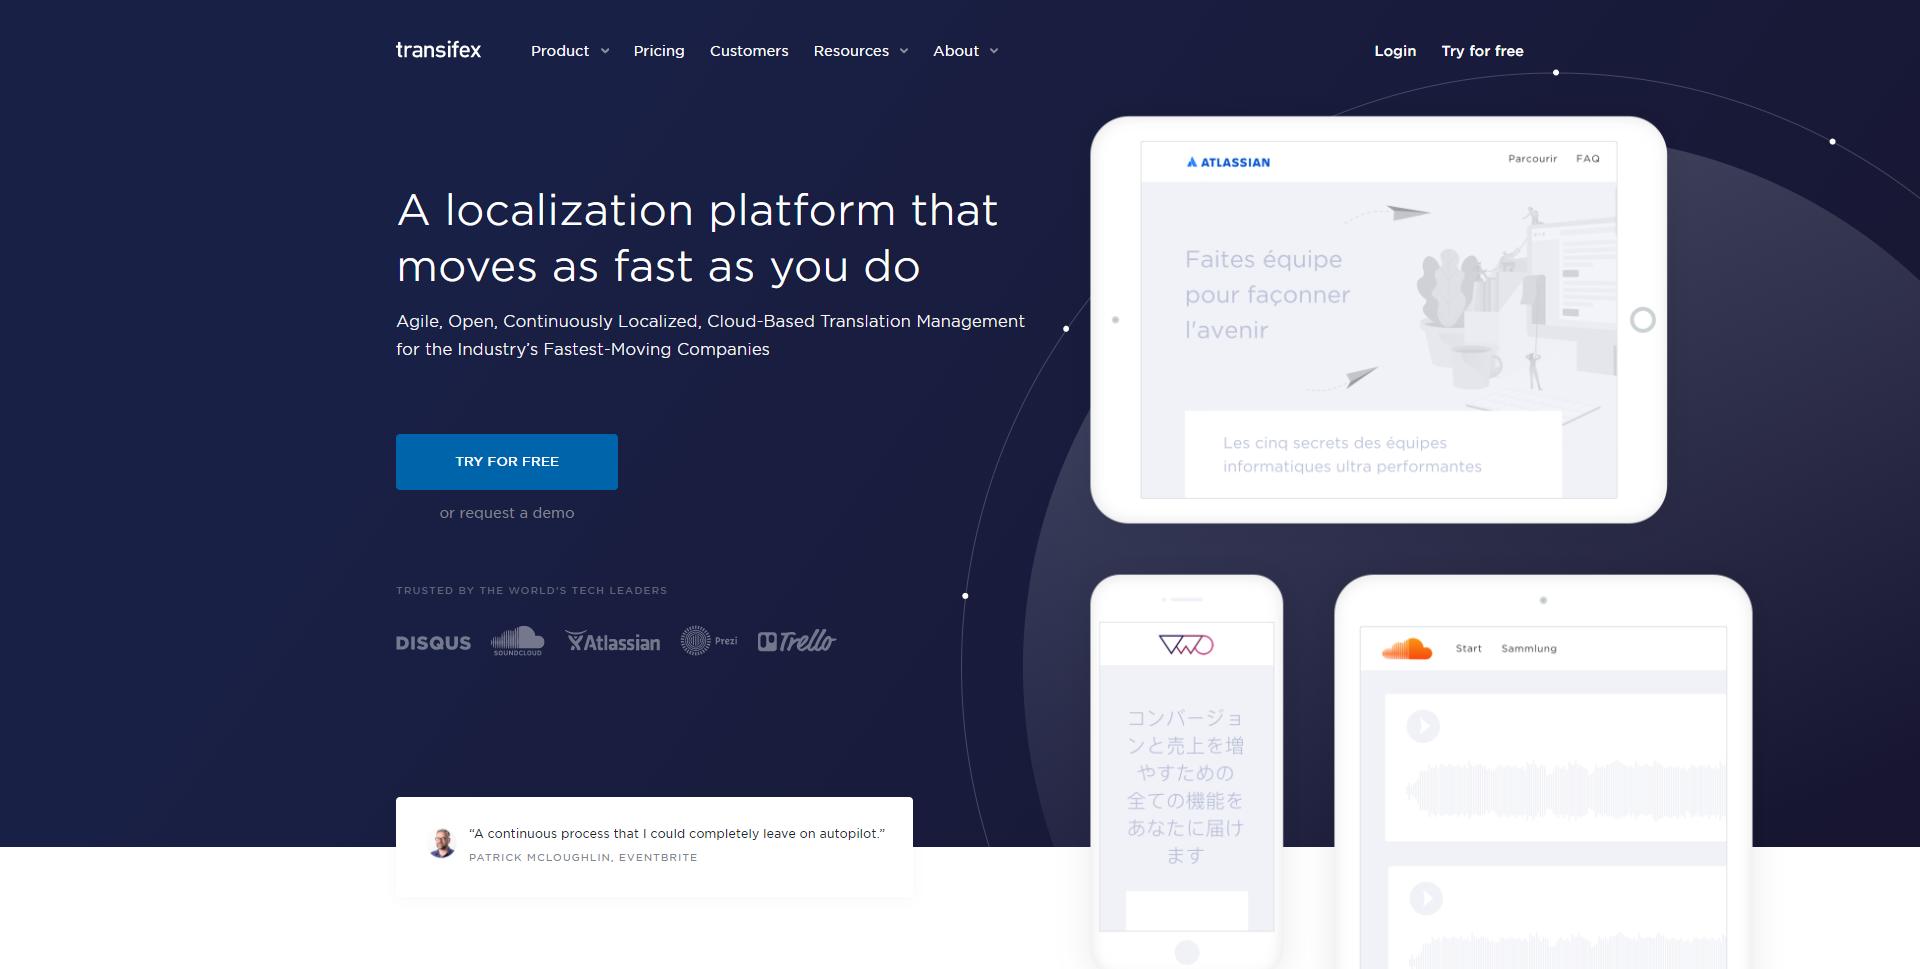 Transifex.com Homepage